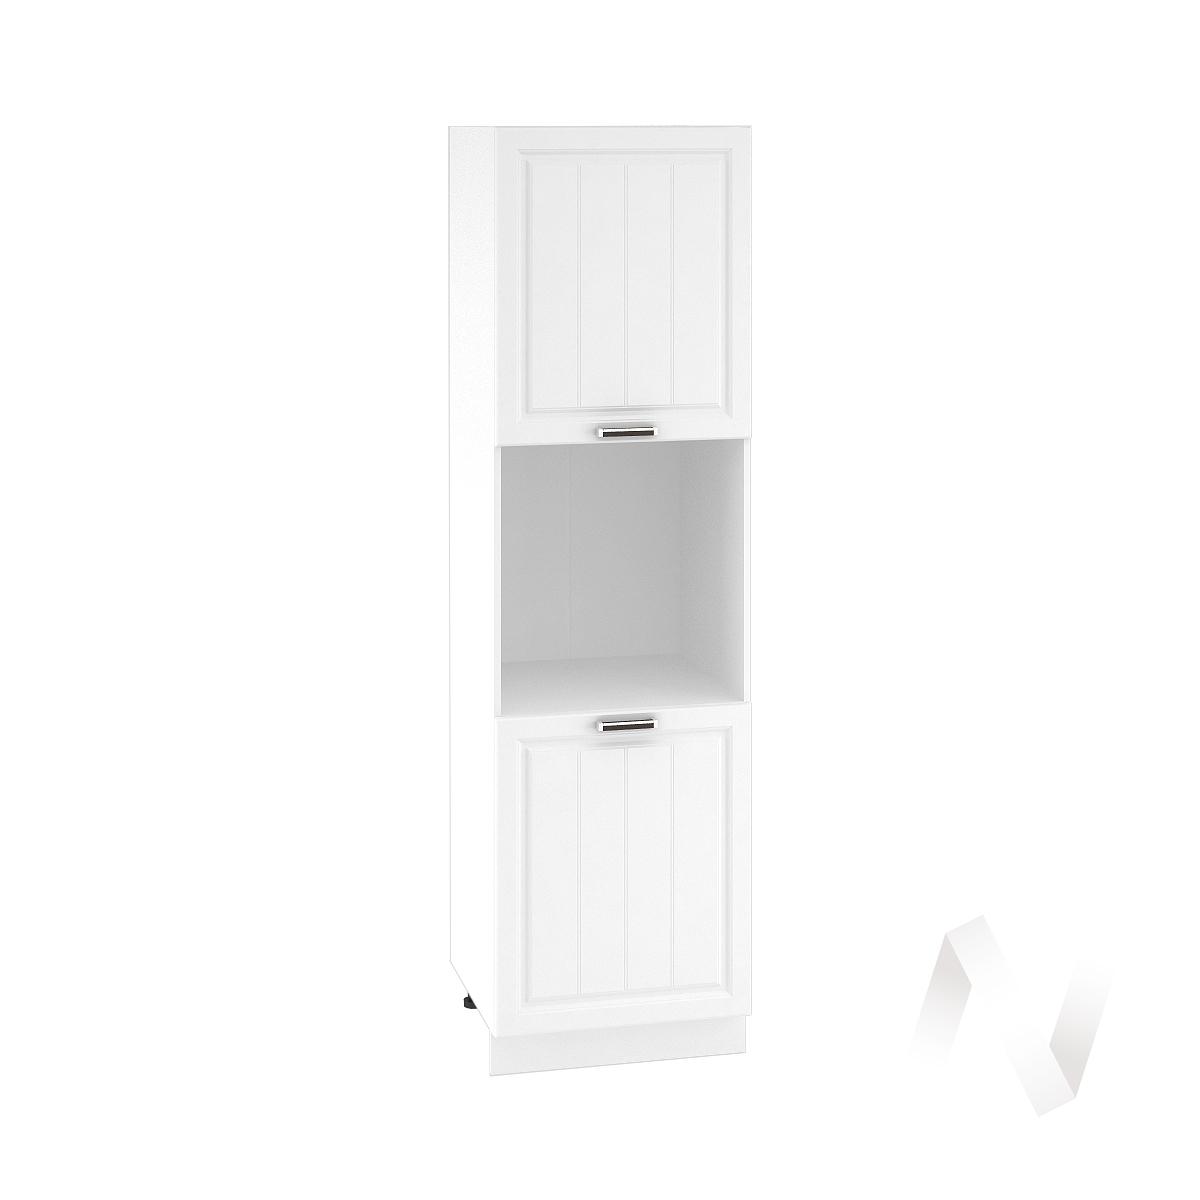 "Кухня ""Прага"": Шкаф пенал 600, ШП 600 (белое дерево/корпус белый)"